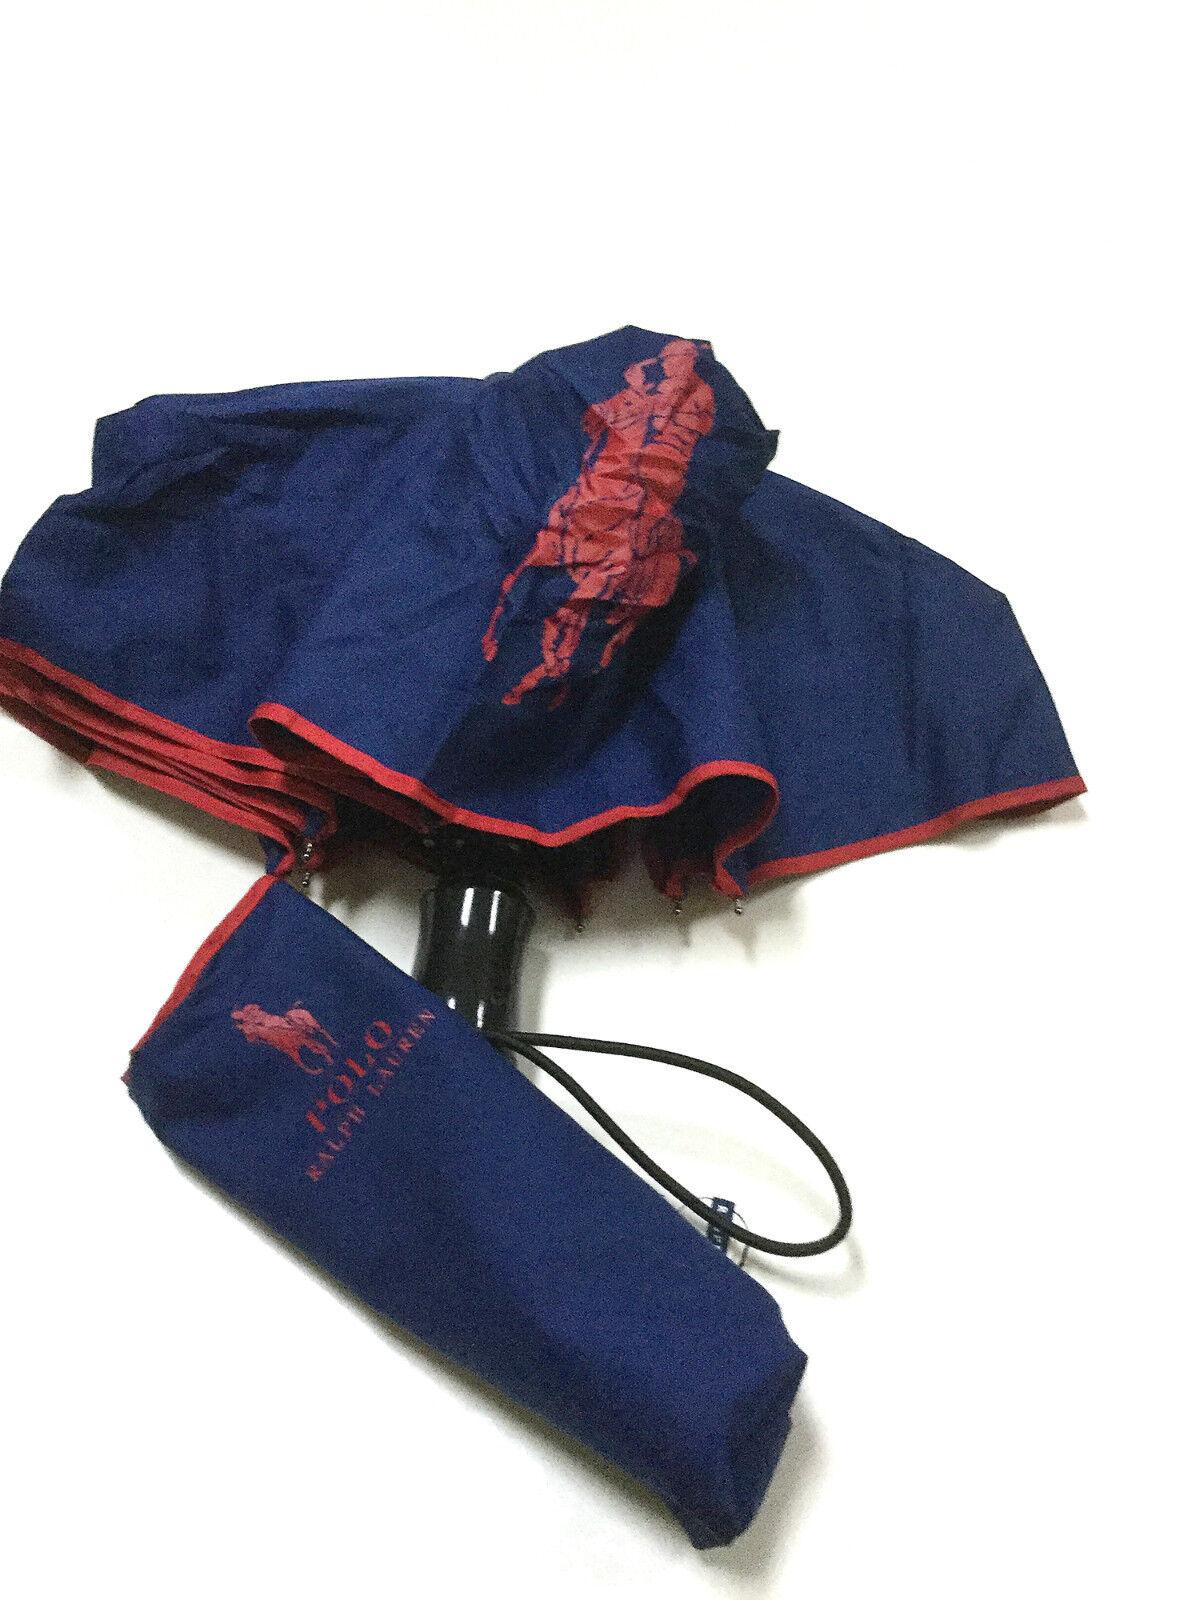 Ralph Lauren Womens navy red compact folding signature umbrella